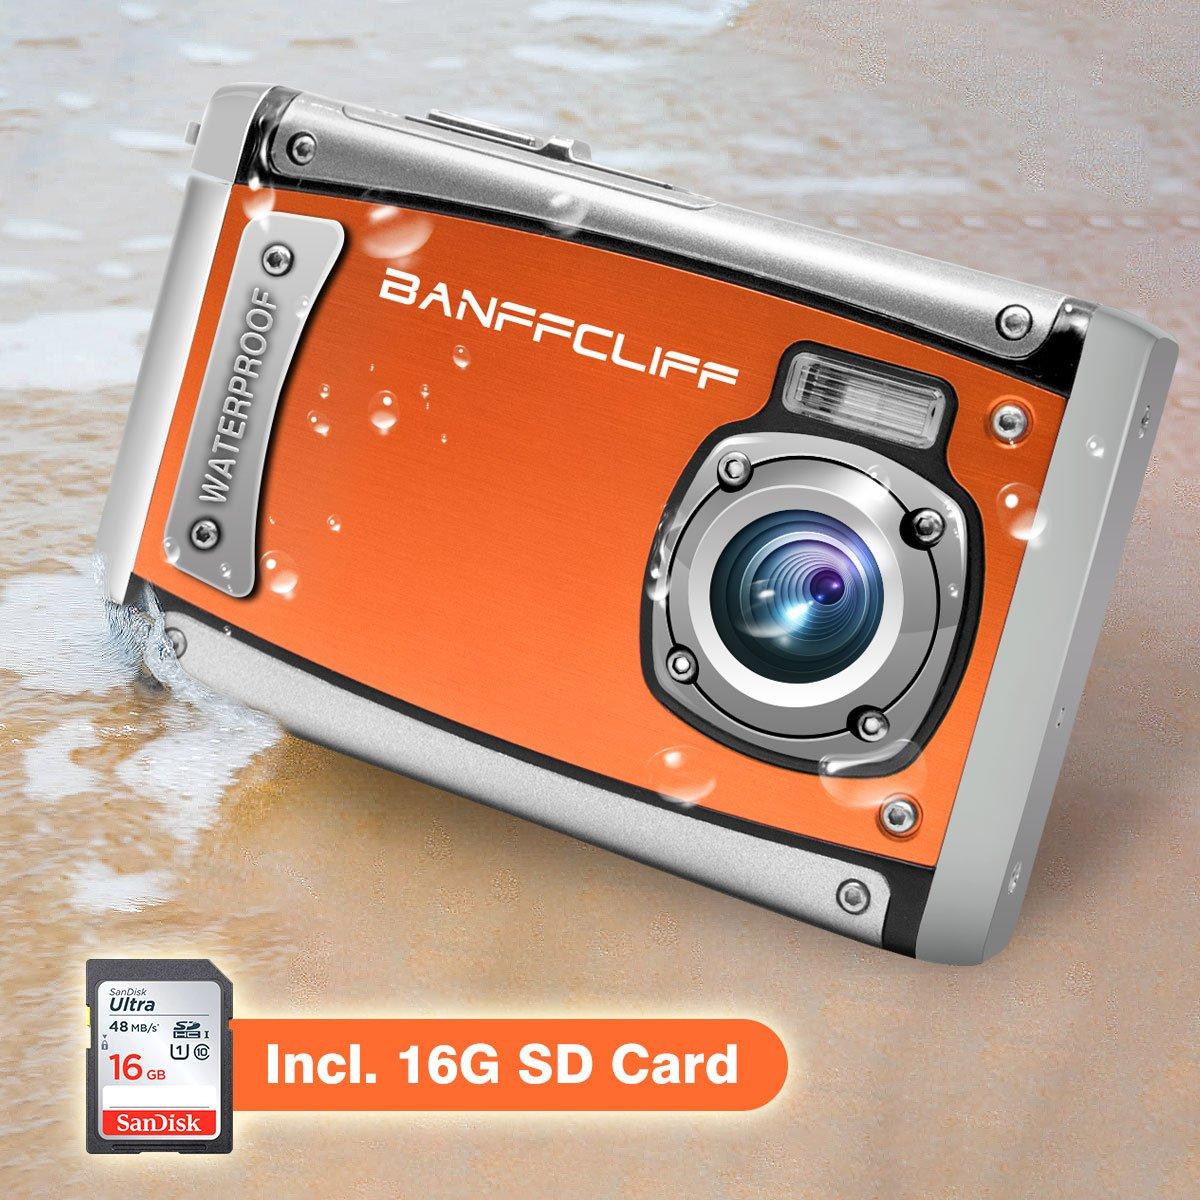 "BanffCliff Waterproof Digital Camera, 21MP 1080P HD Anti-Shock 3 Meter Underwater Action Cam, 2.4"" LCD Screen Flash Mic IP68 Camcorder 8X Digital Zoom Water Sports Video Recorder 16G SD Card Included"